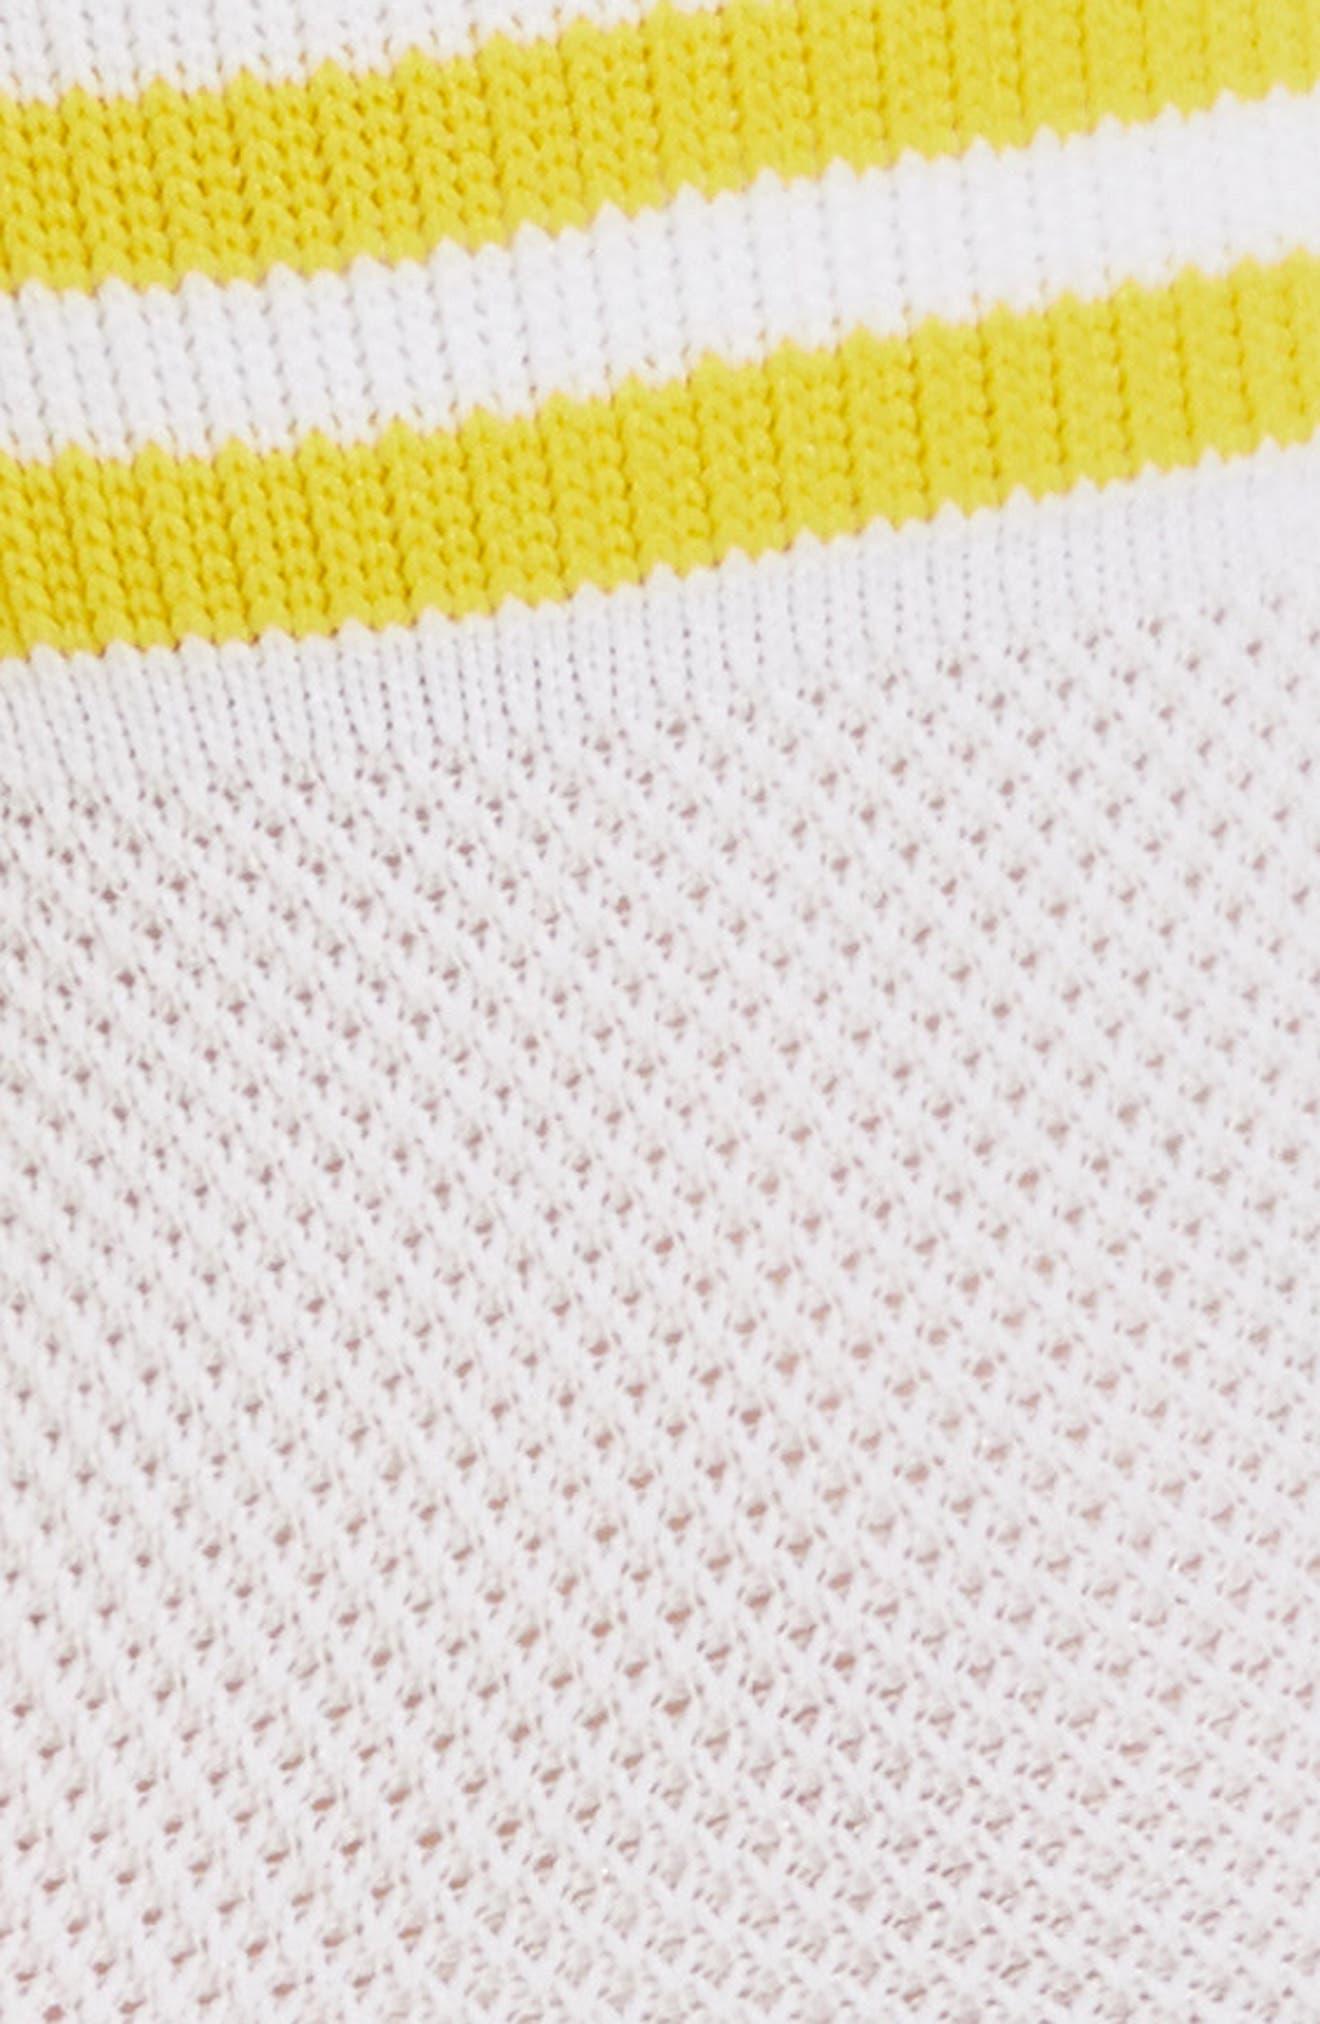 Stripe Mesh Ankle Socks,                             Alternate thumbnail 2, color,                             White/ Yellow